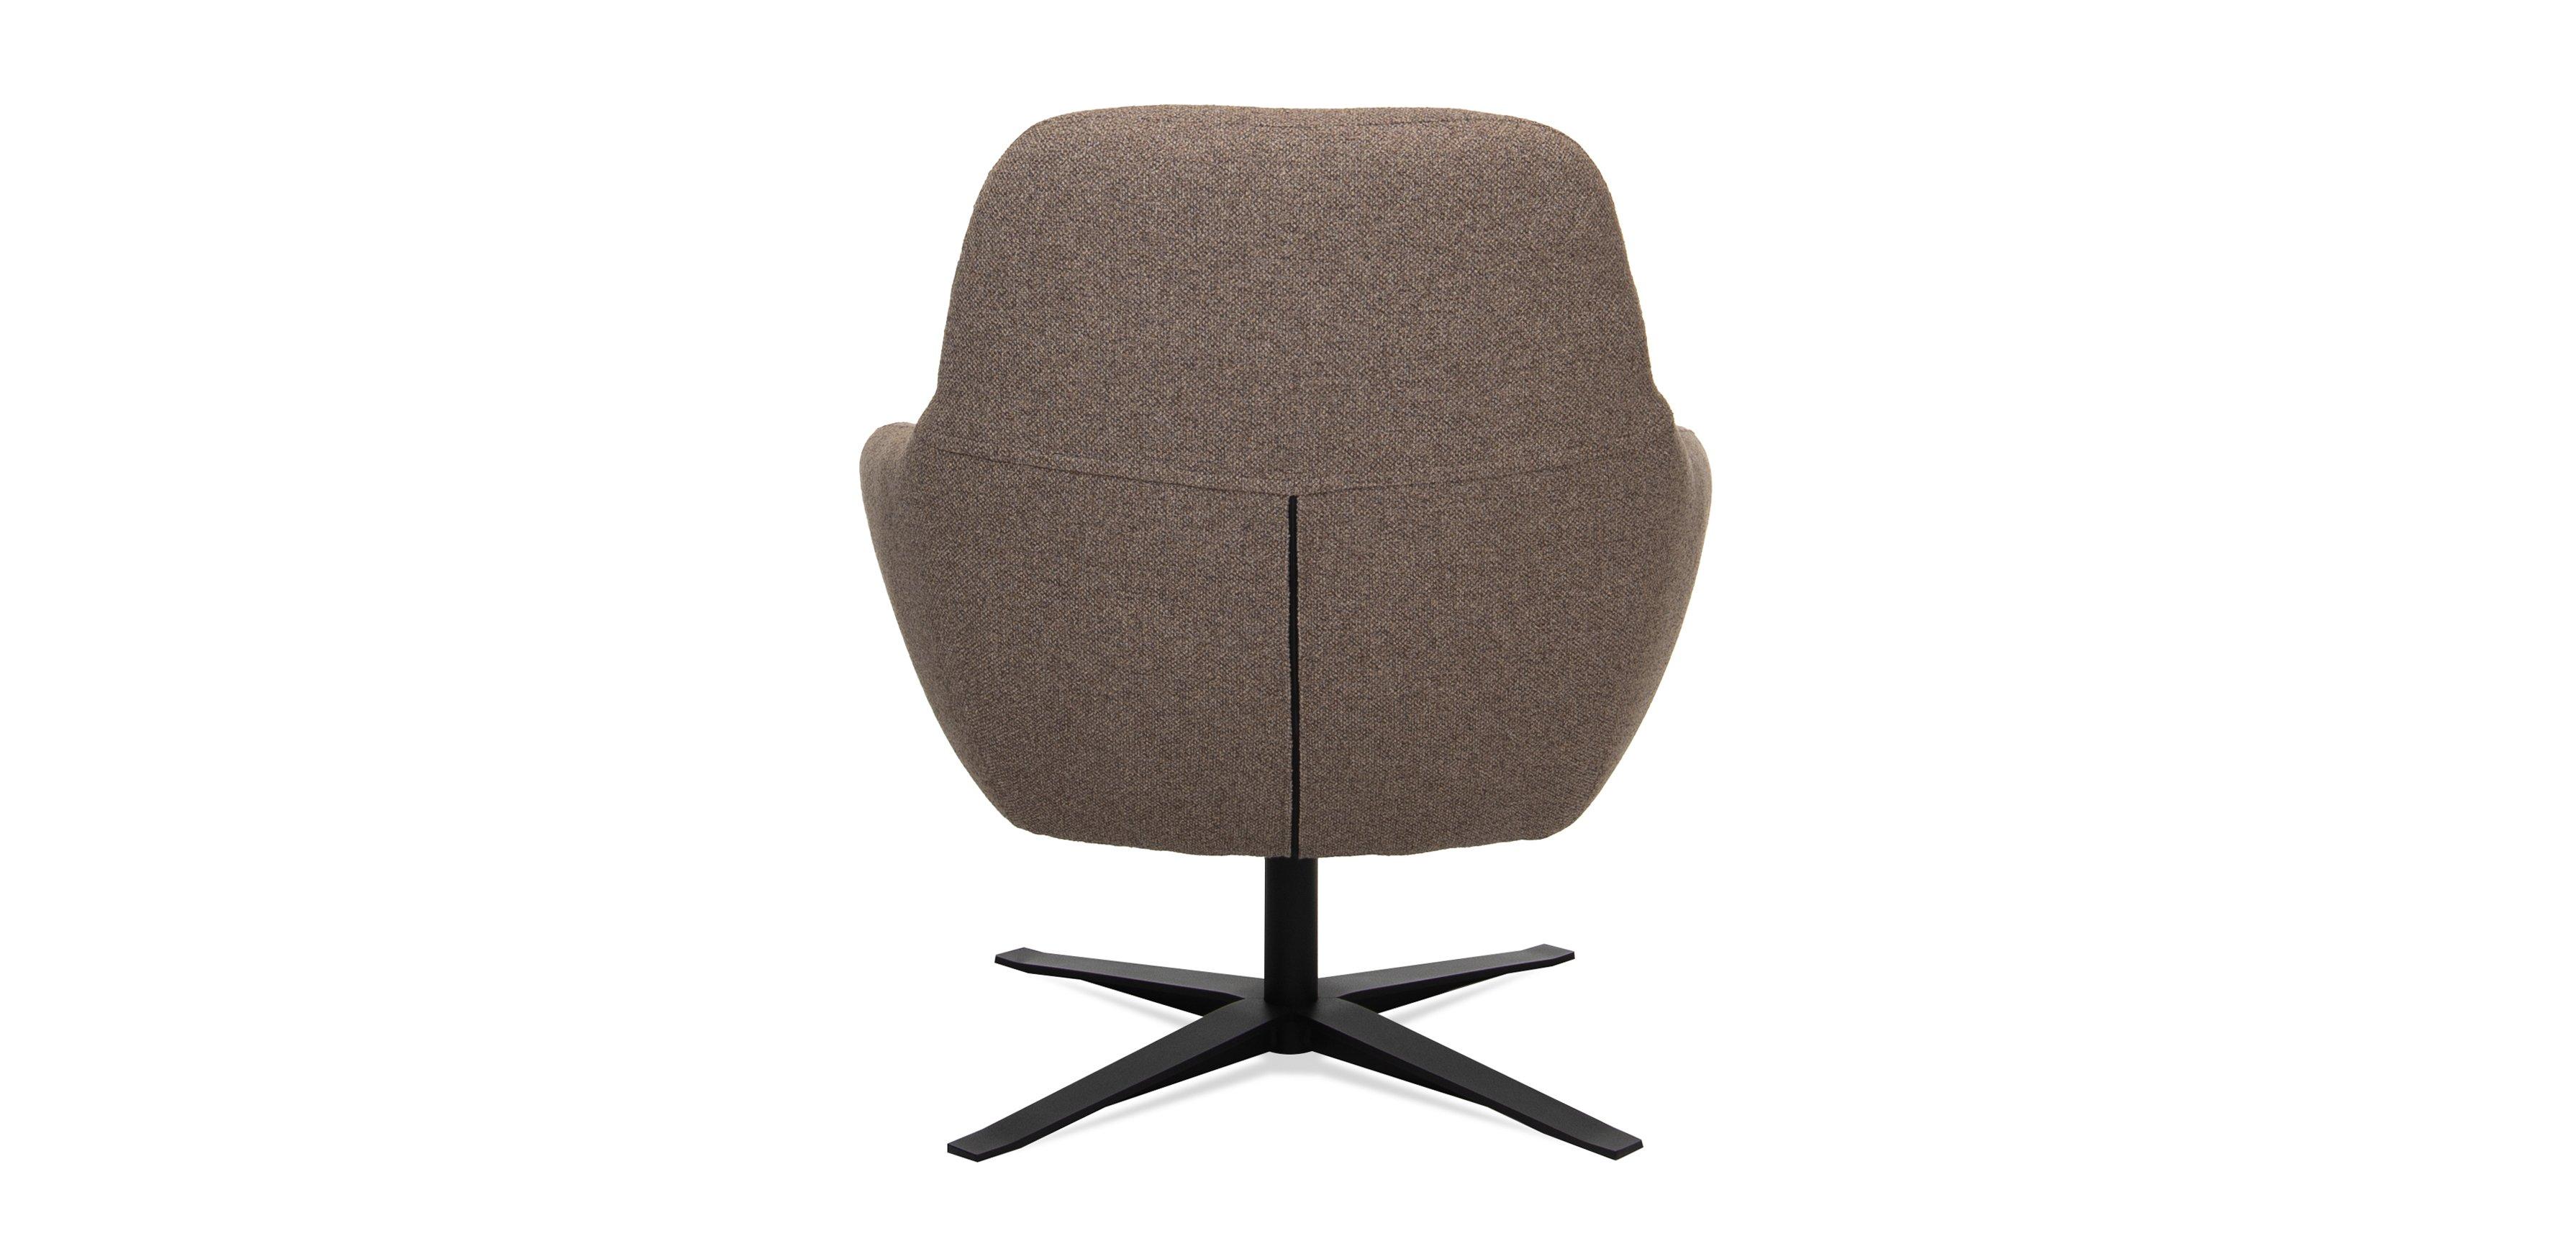 Python fauteuil DYYK 3580x1750 6